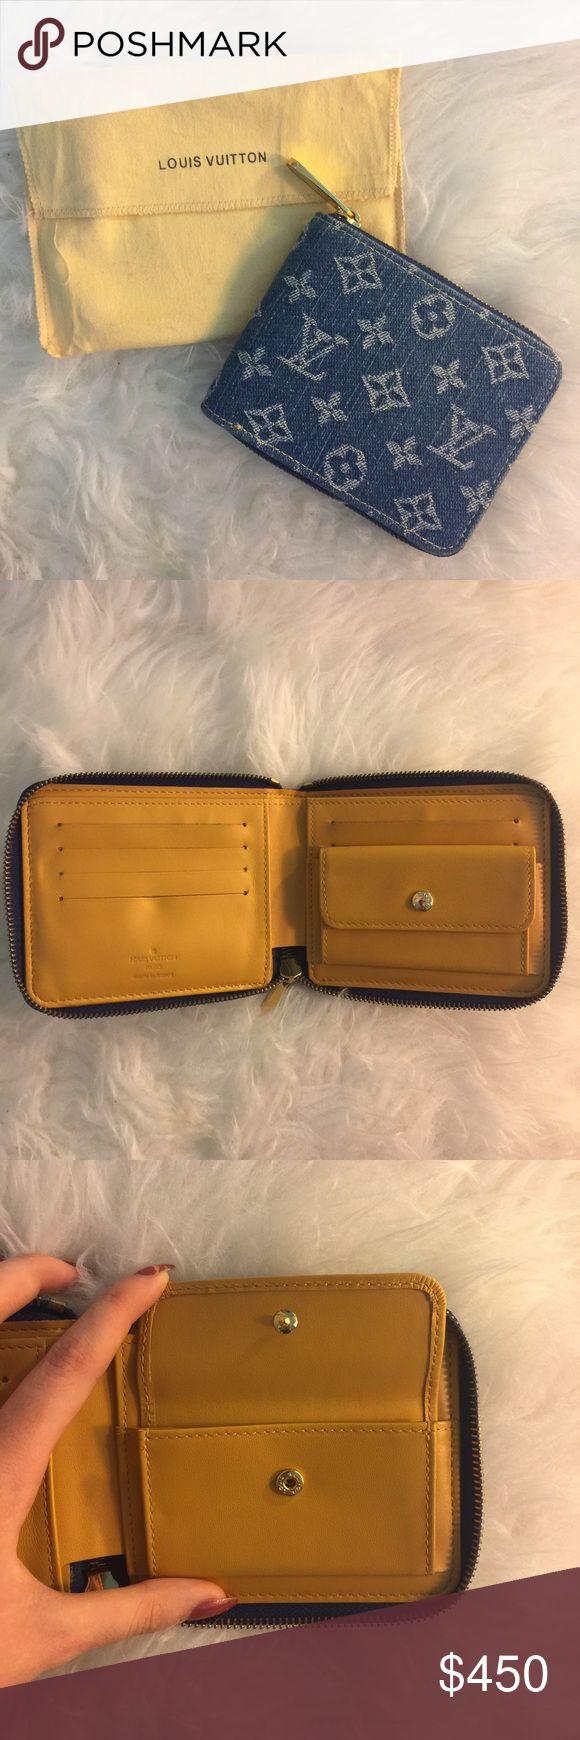 LOUIS VUITTON denim monogram zip bifold wallet perfect condition, never used, kept in dust bag,  Louis Vuitton denim monogram zip bifold wallet AUTHENTIC Louis Vuitton Bags Wallets